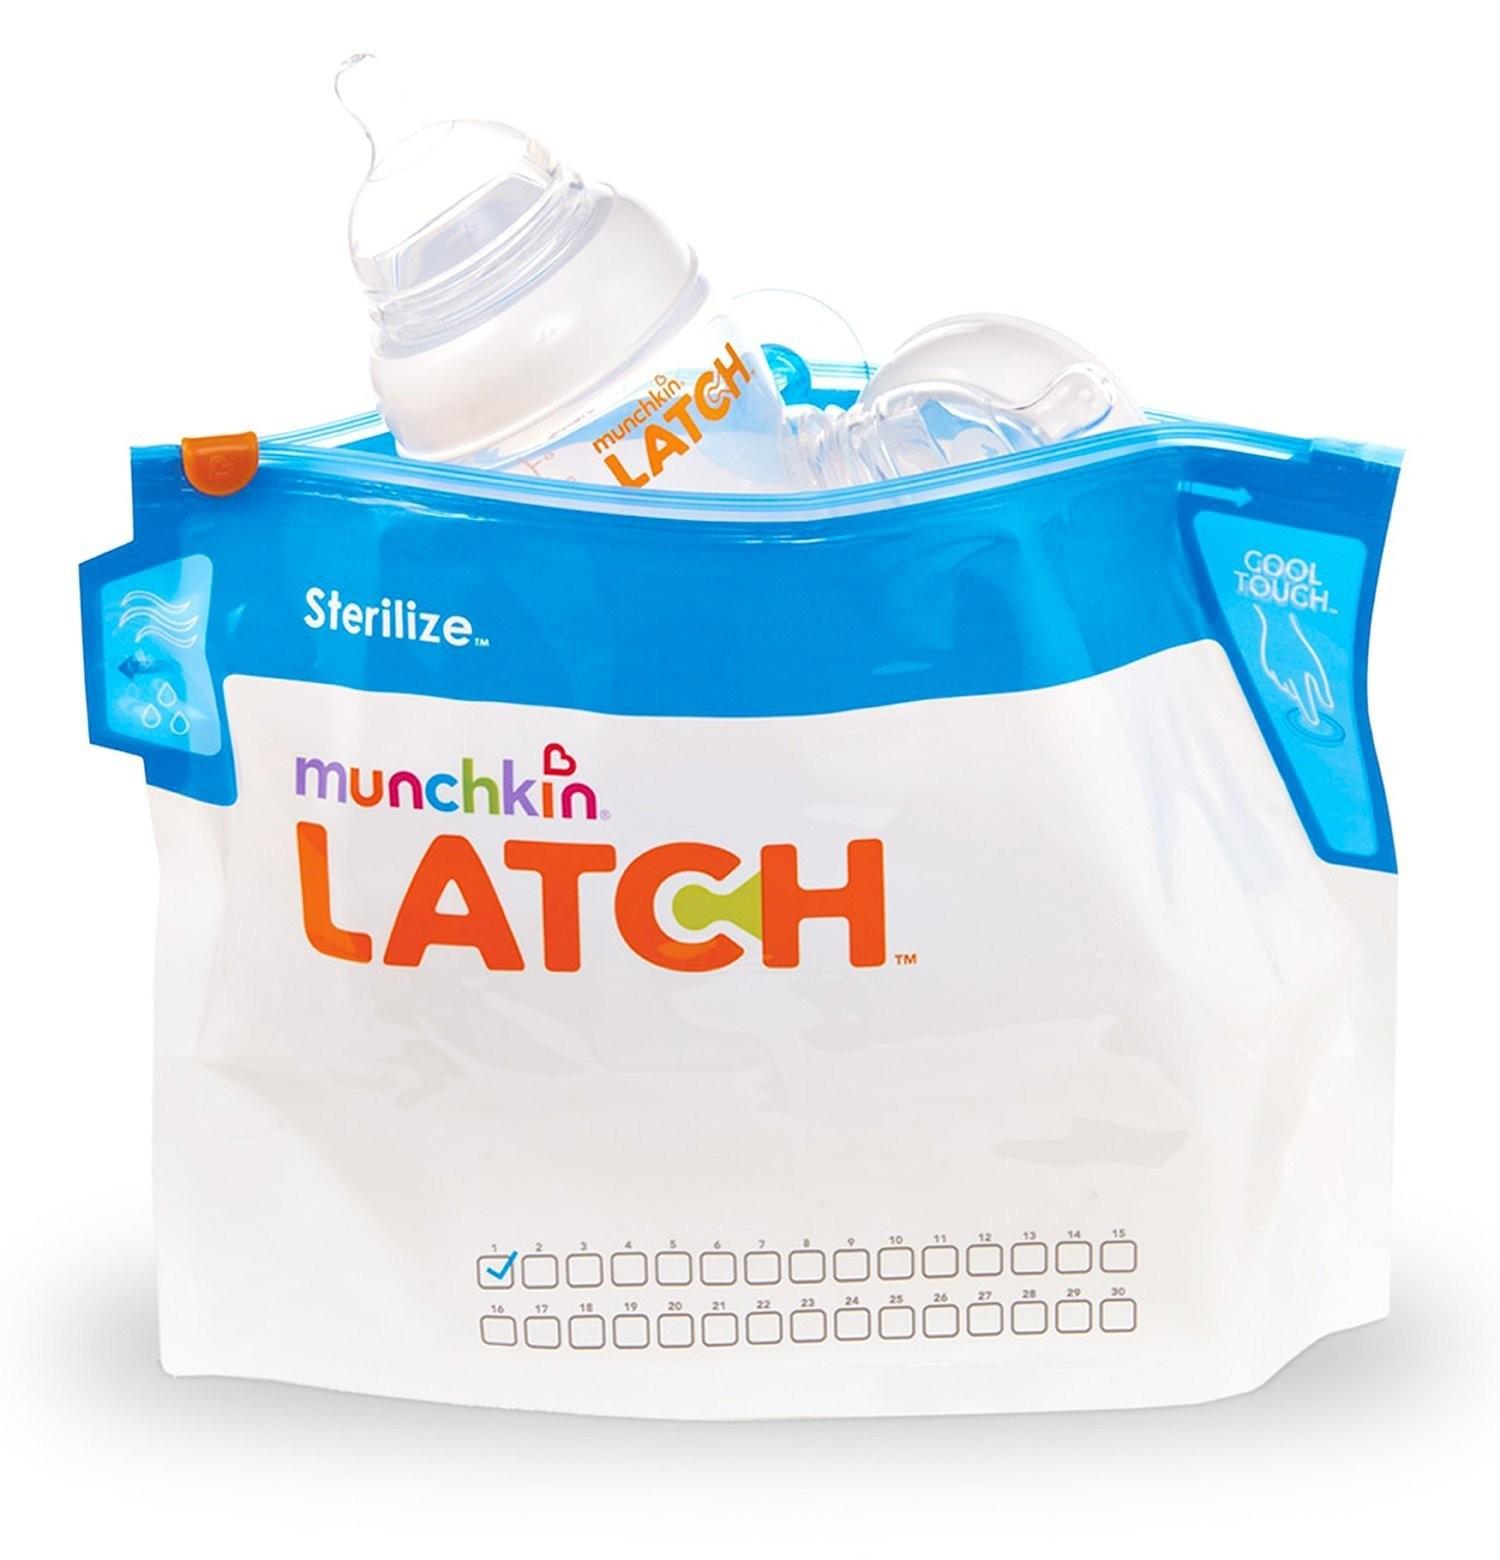 Munchkin LATCH Sterilize Bags - 6pk